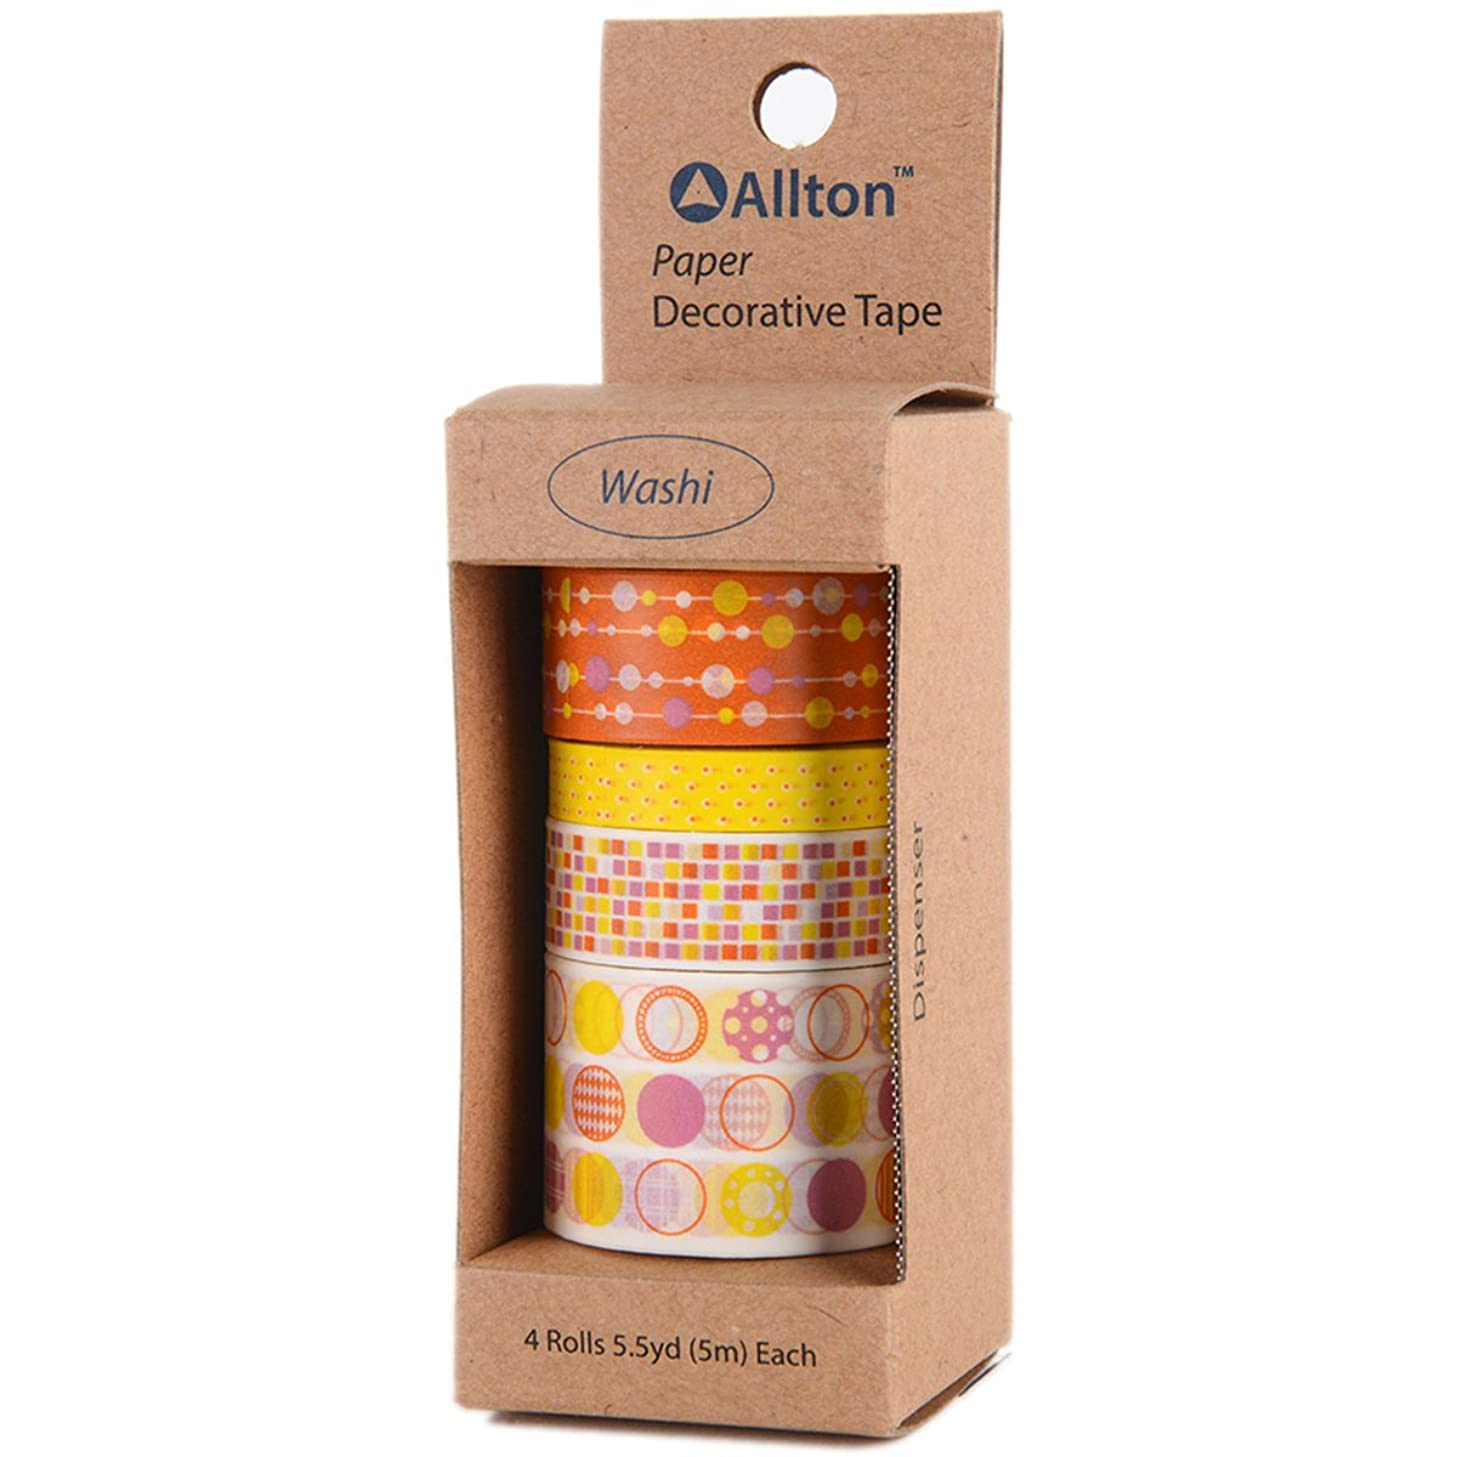 Allton TPX990010 Decorative Washi Tape 5m 4/Pkg Yellow Orange POP,